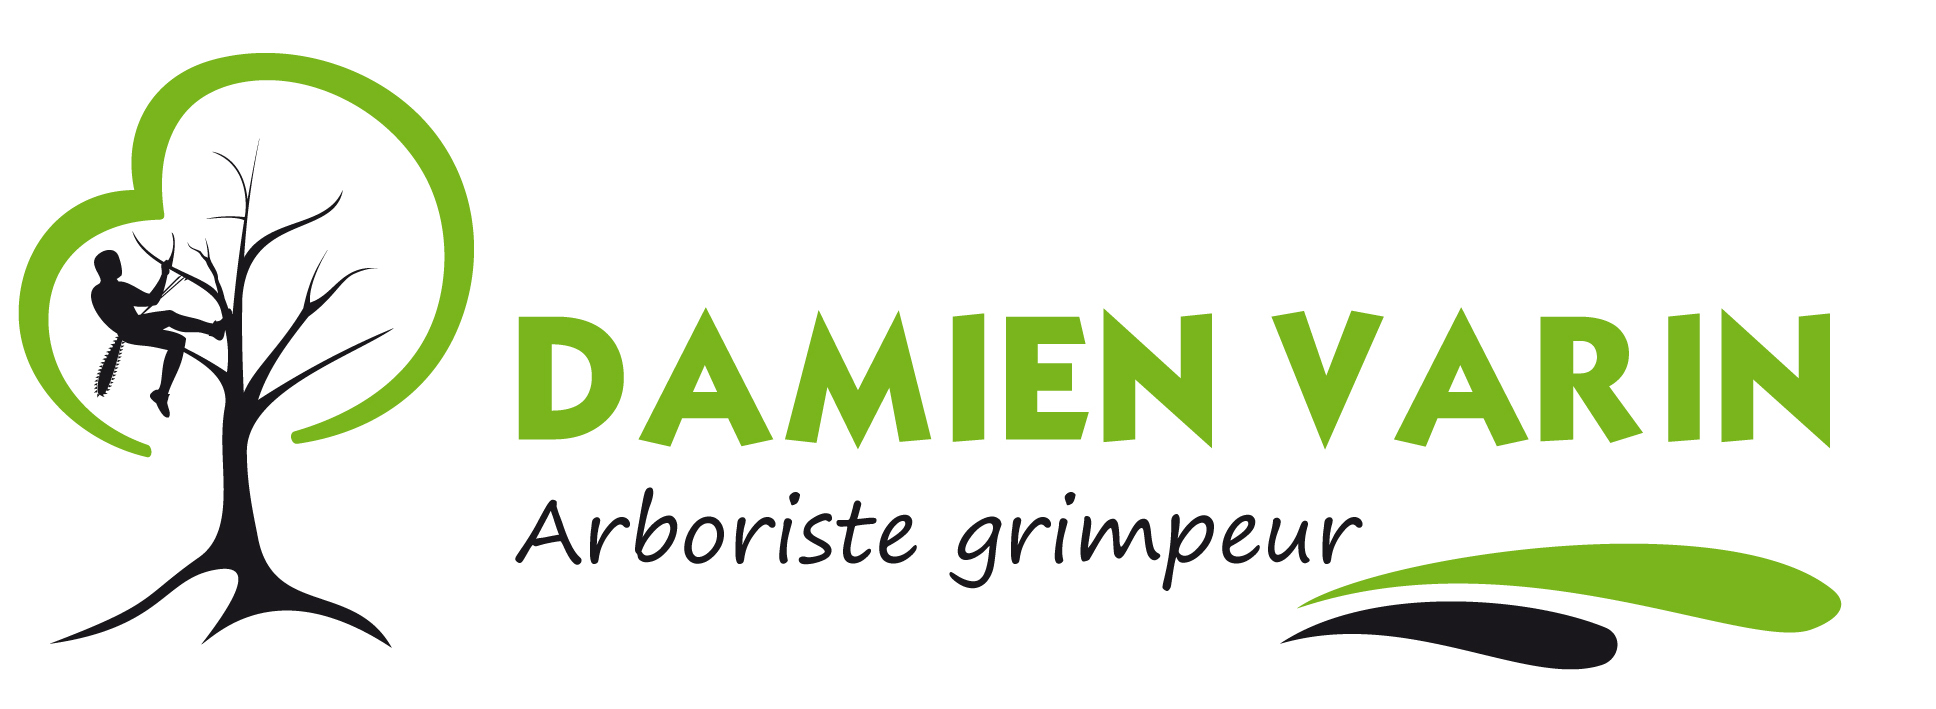 Damien Varin Arboriste Grimpeur